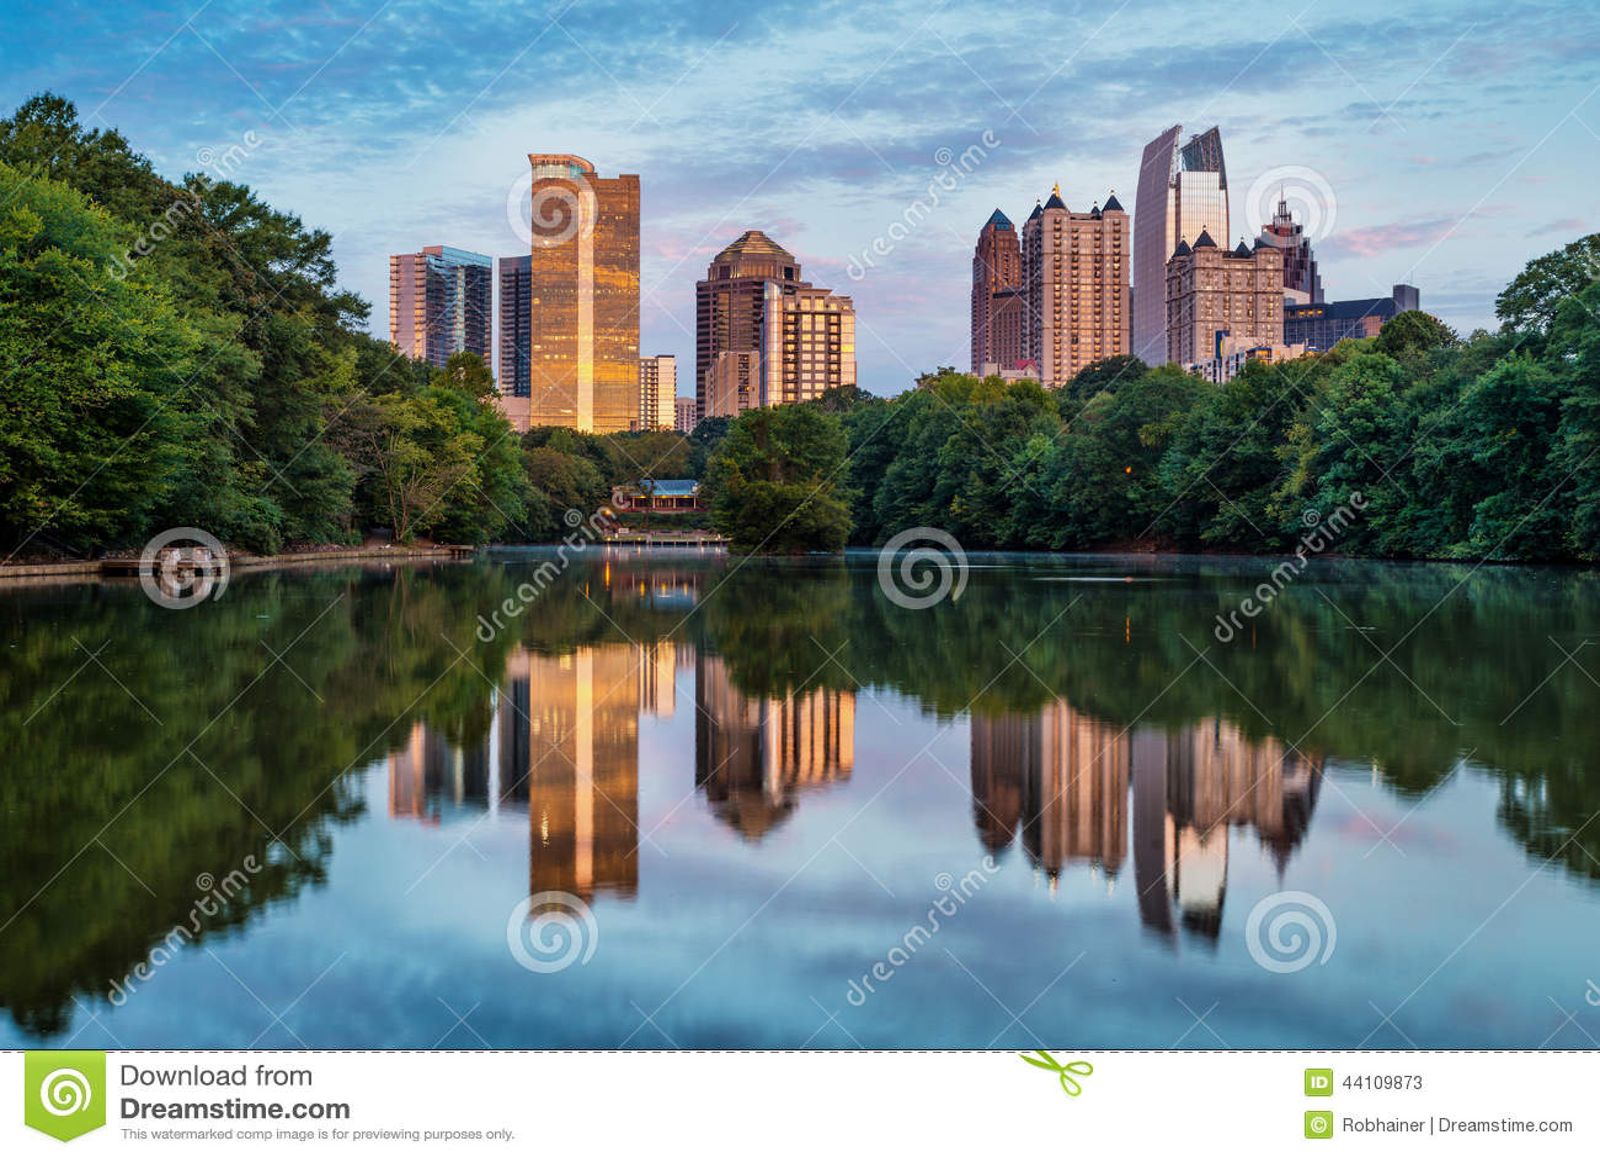 Linia horyzontu w centrum Atlanta, Gruzja